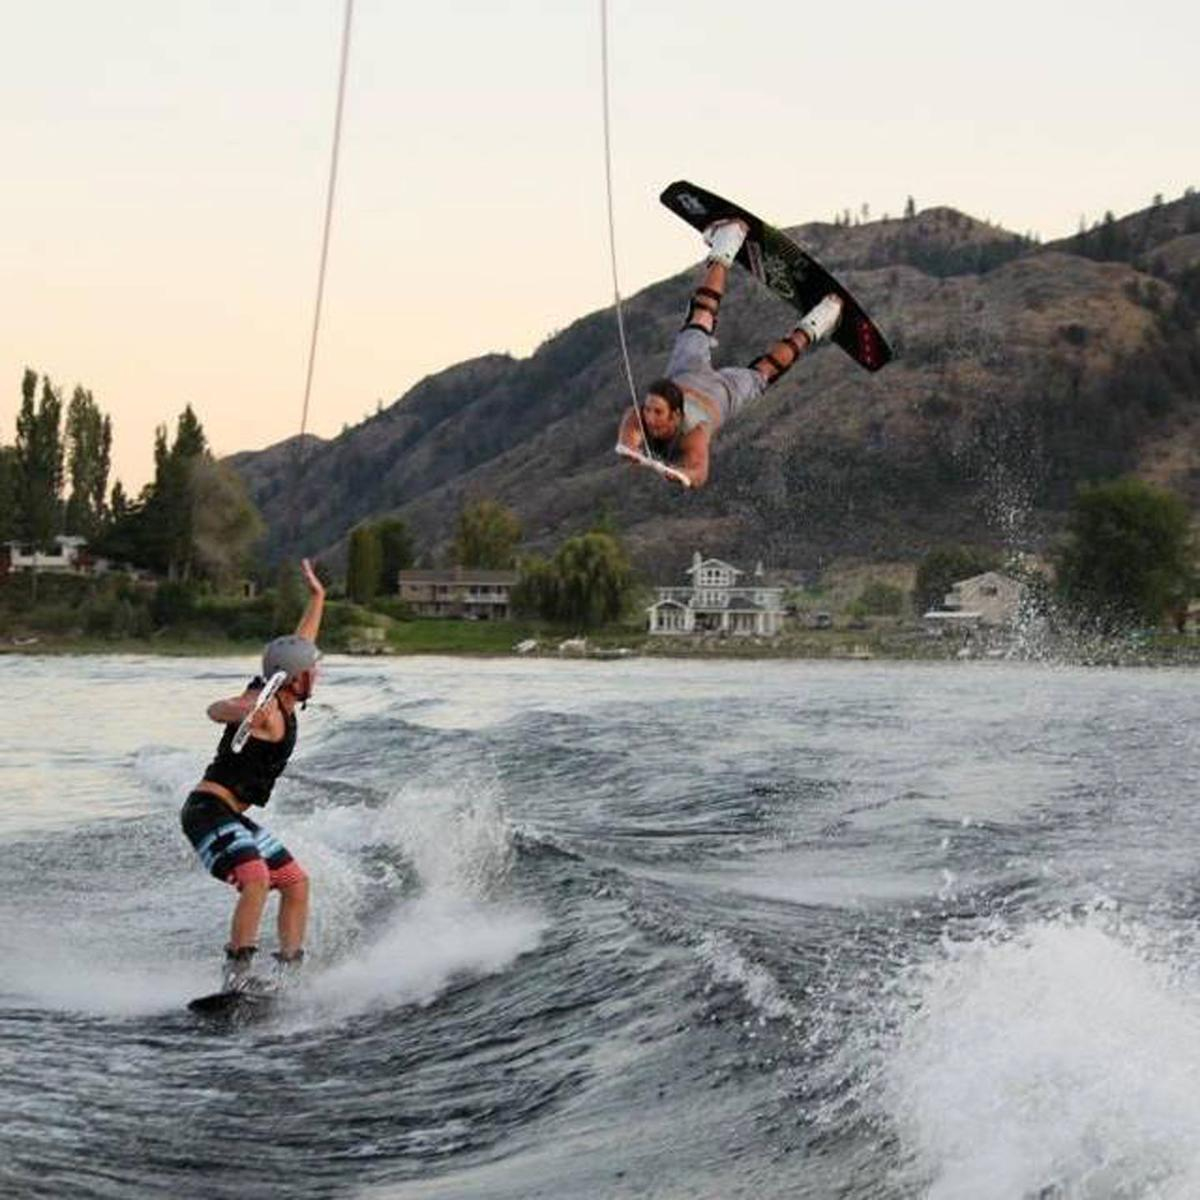 Wake boarding on Lake Osoyoos